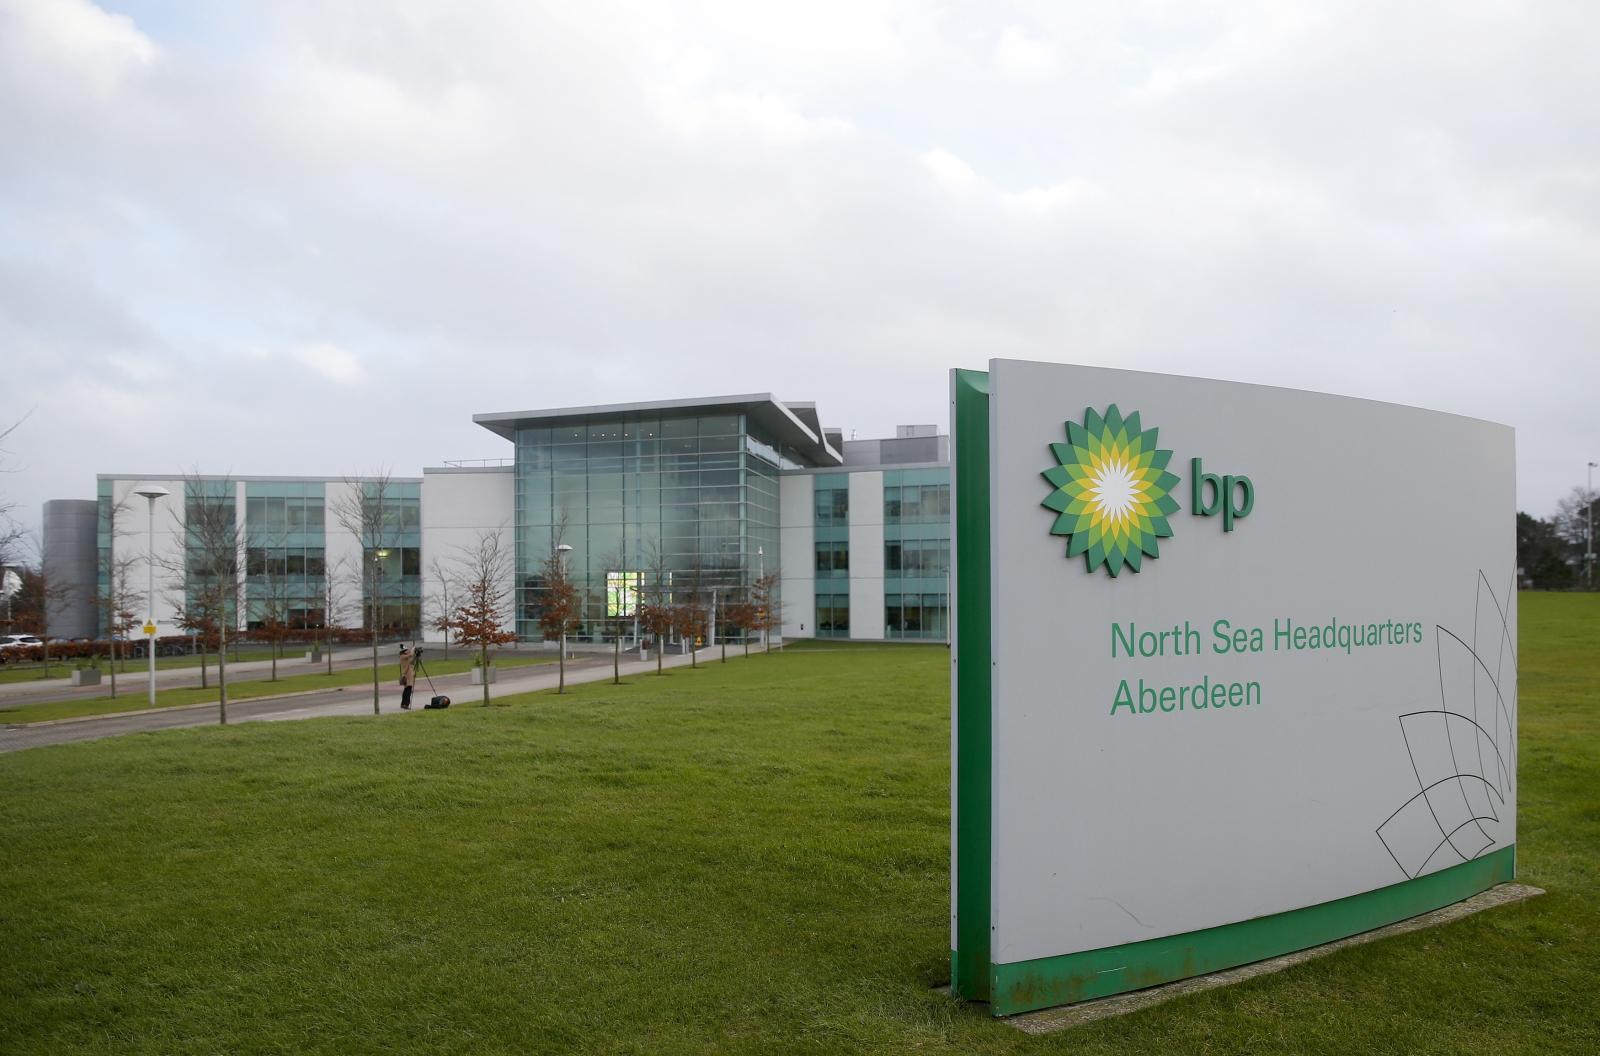 BP's North Sea Headquarters is seen in Aberdeen